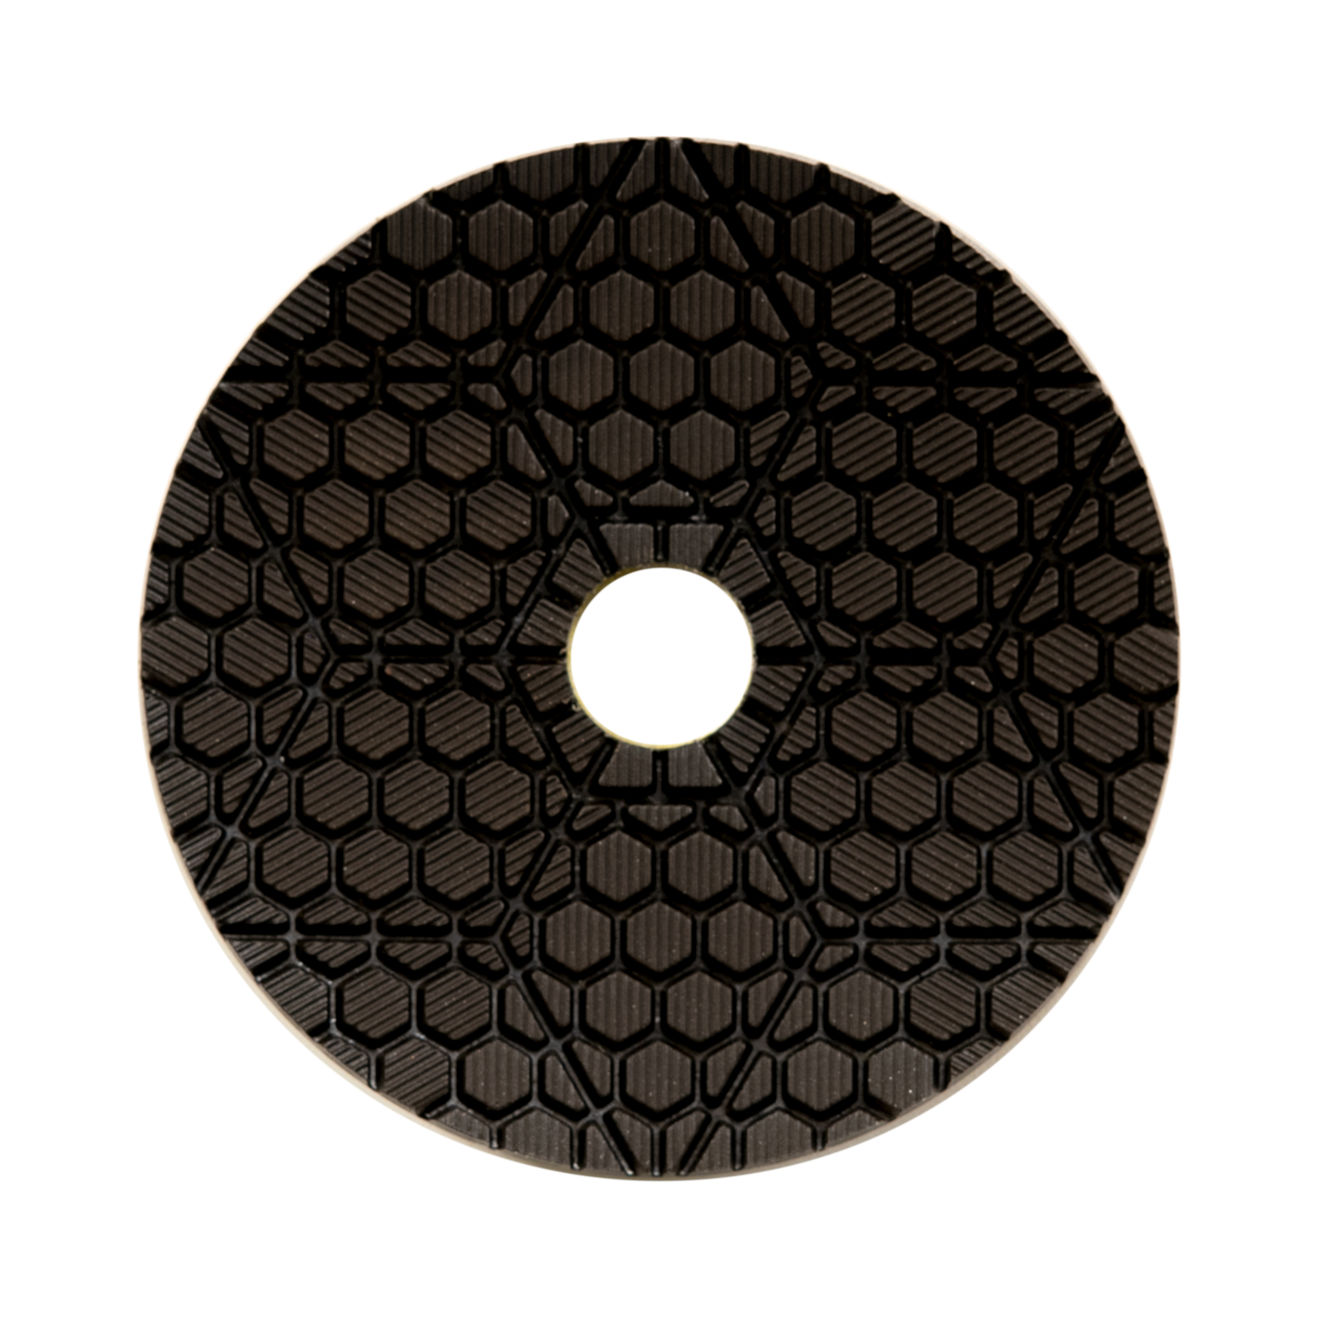 "ODYN Premium Wet Stone Polishing Pad 4"" x 5/8"" - 200 Grit"